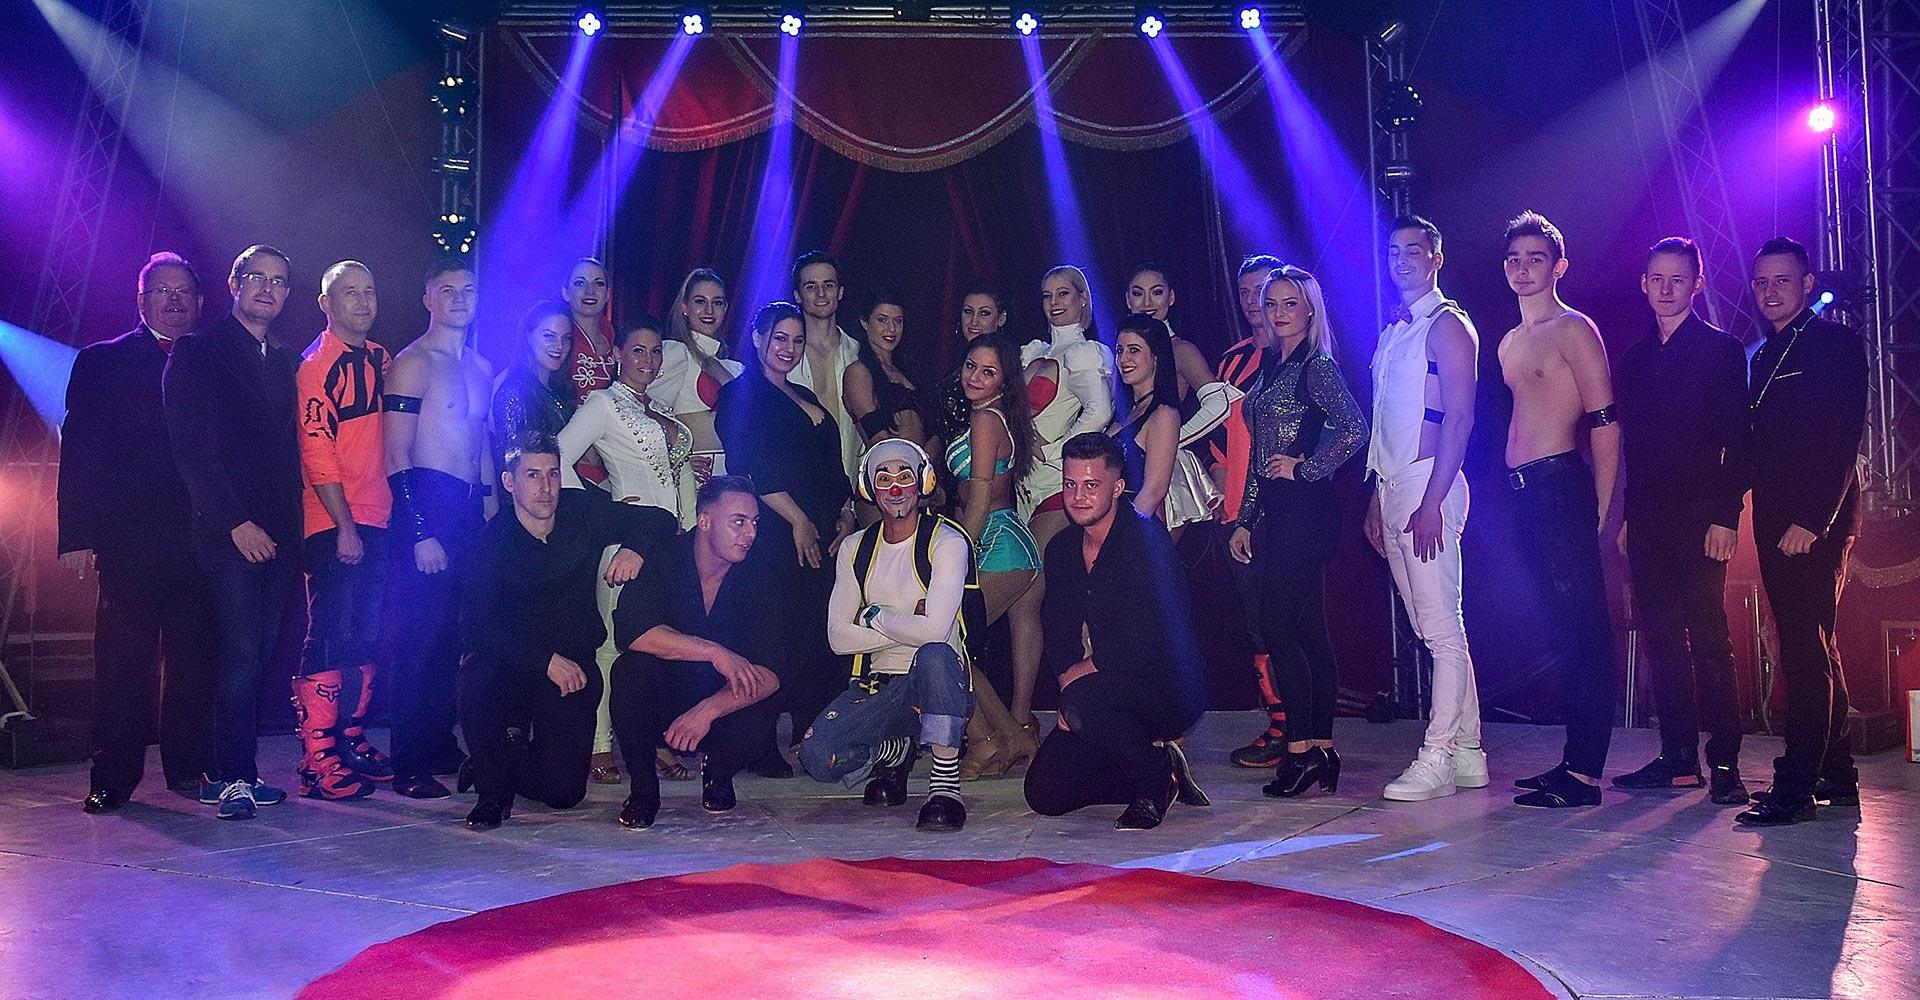 zirkus düsseldorf remscheid